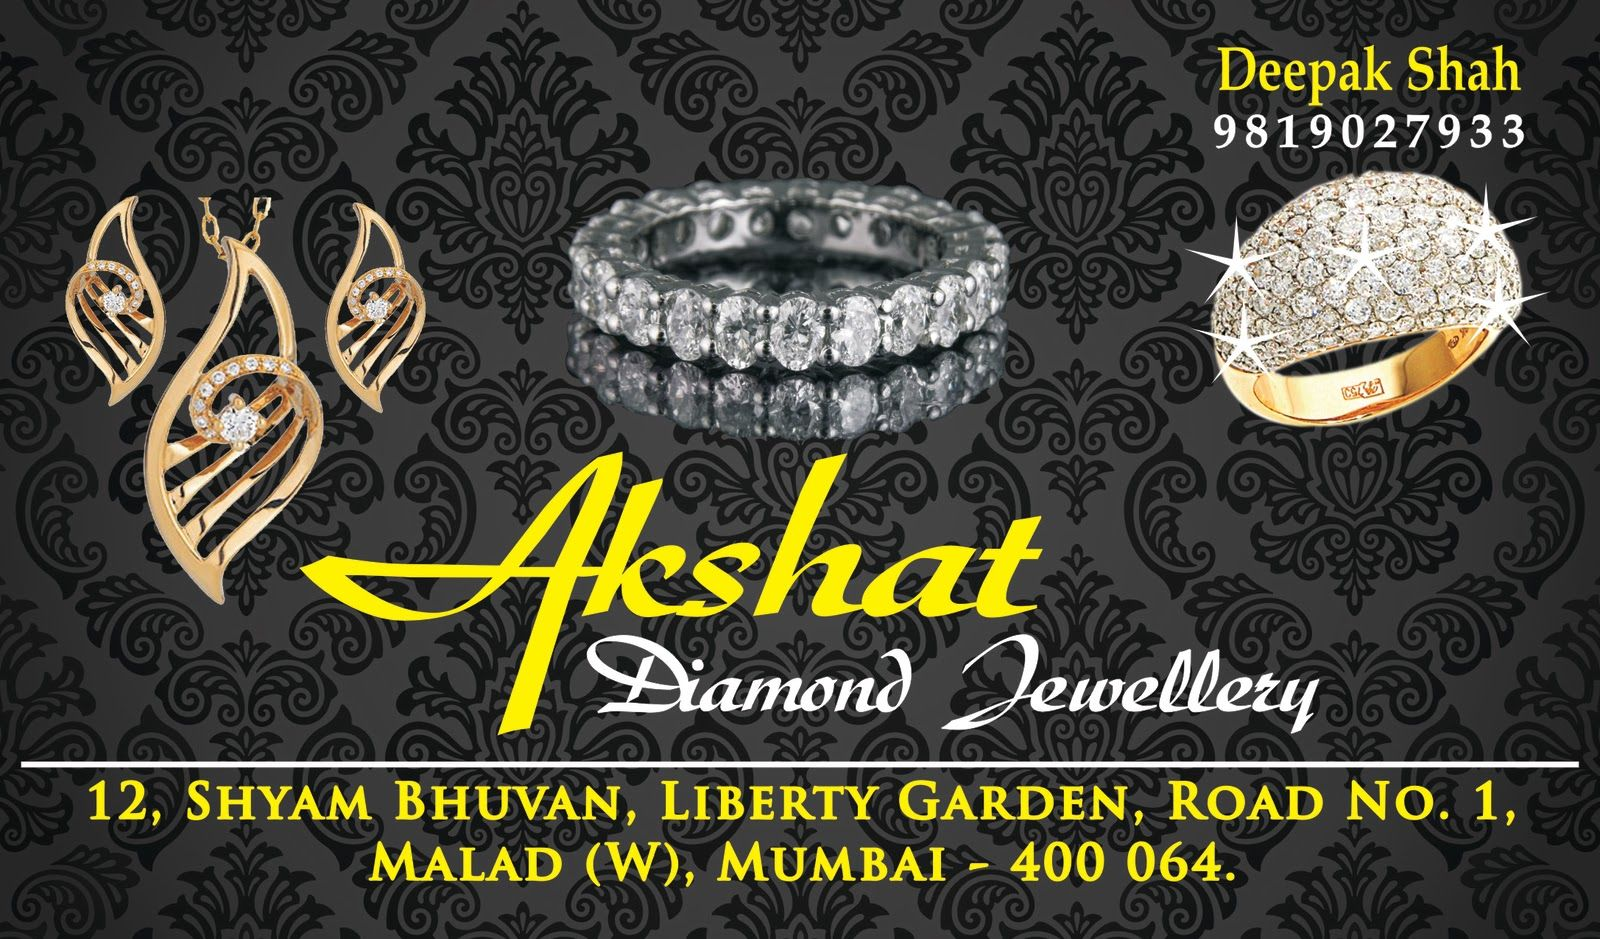 Creative Diamond Jewellery Business Card Design | Creative Diamond ...